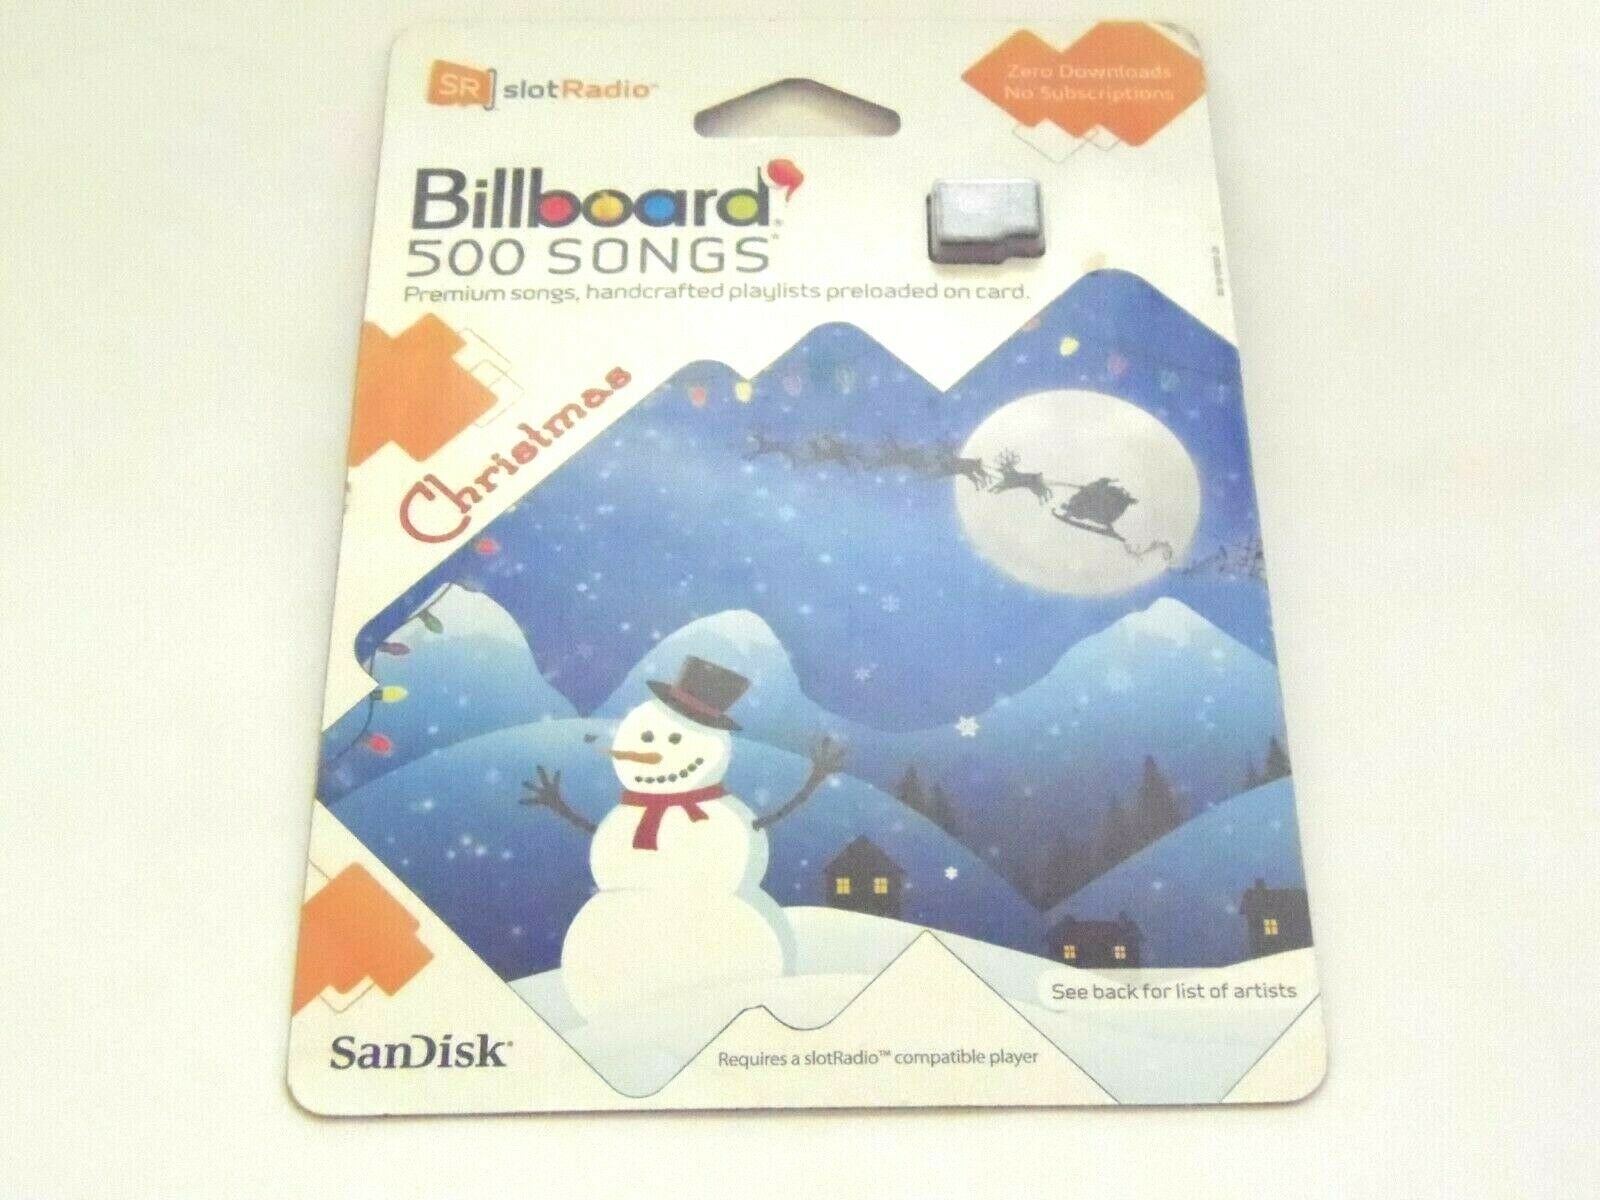 Sandisk SlotRadio/Slot Radio Billboard 1,000 Songs Card New/Sealed